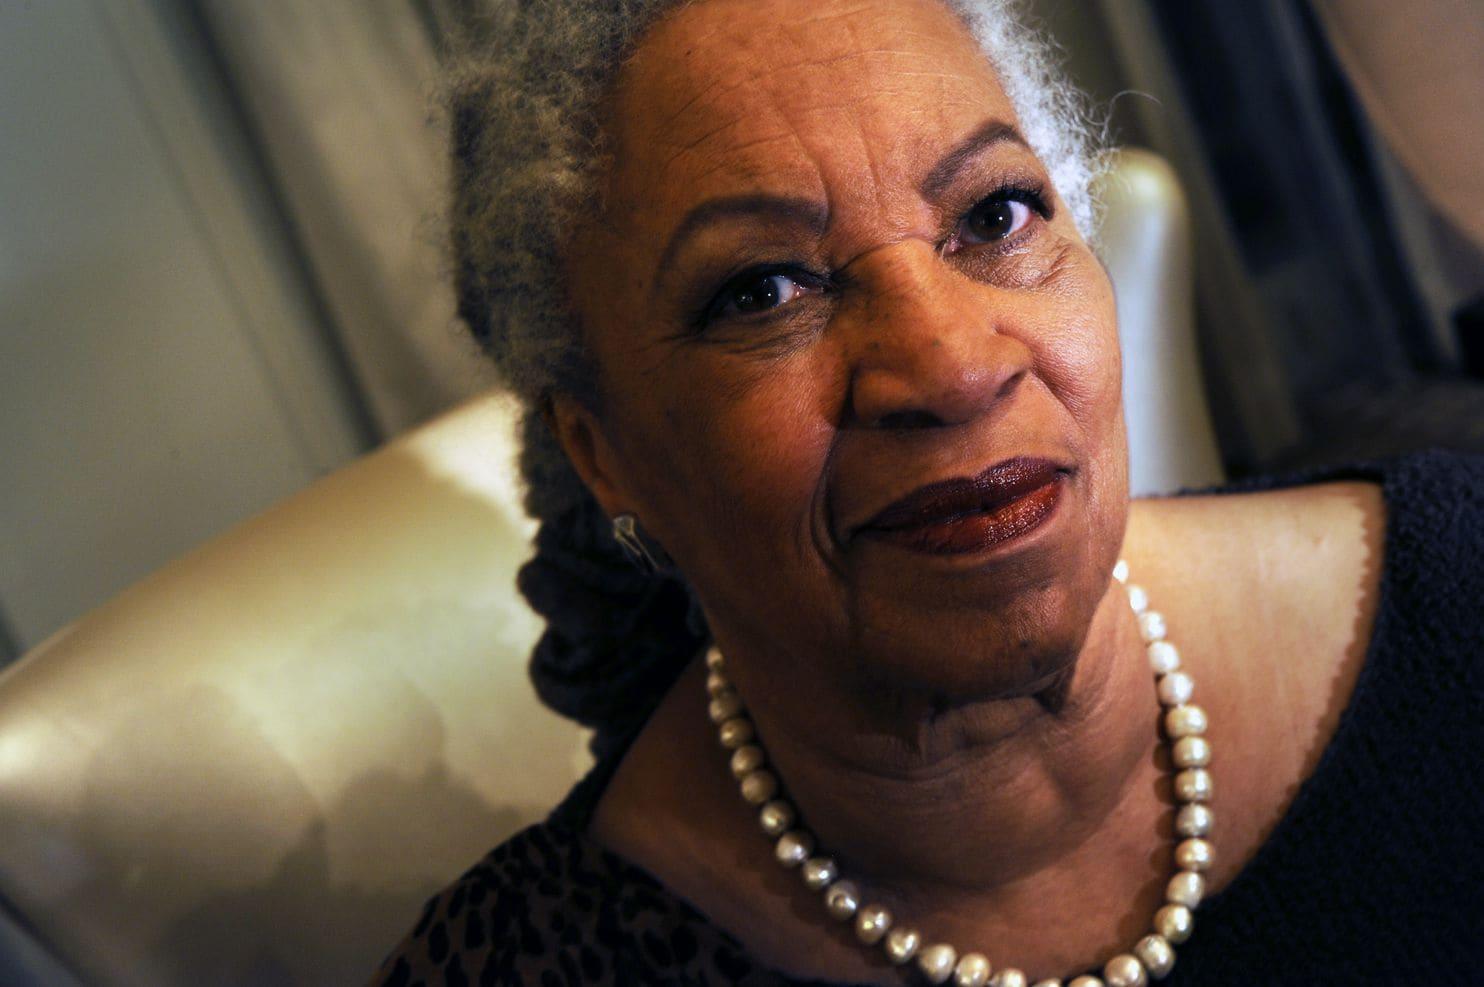 Washington Post: How Toni Morrison's words pierced me, as a black Christian female writer - August 6, 2019